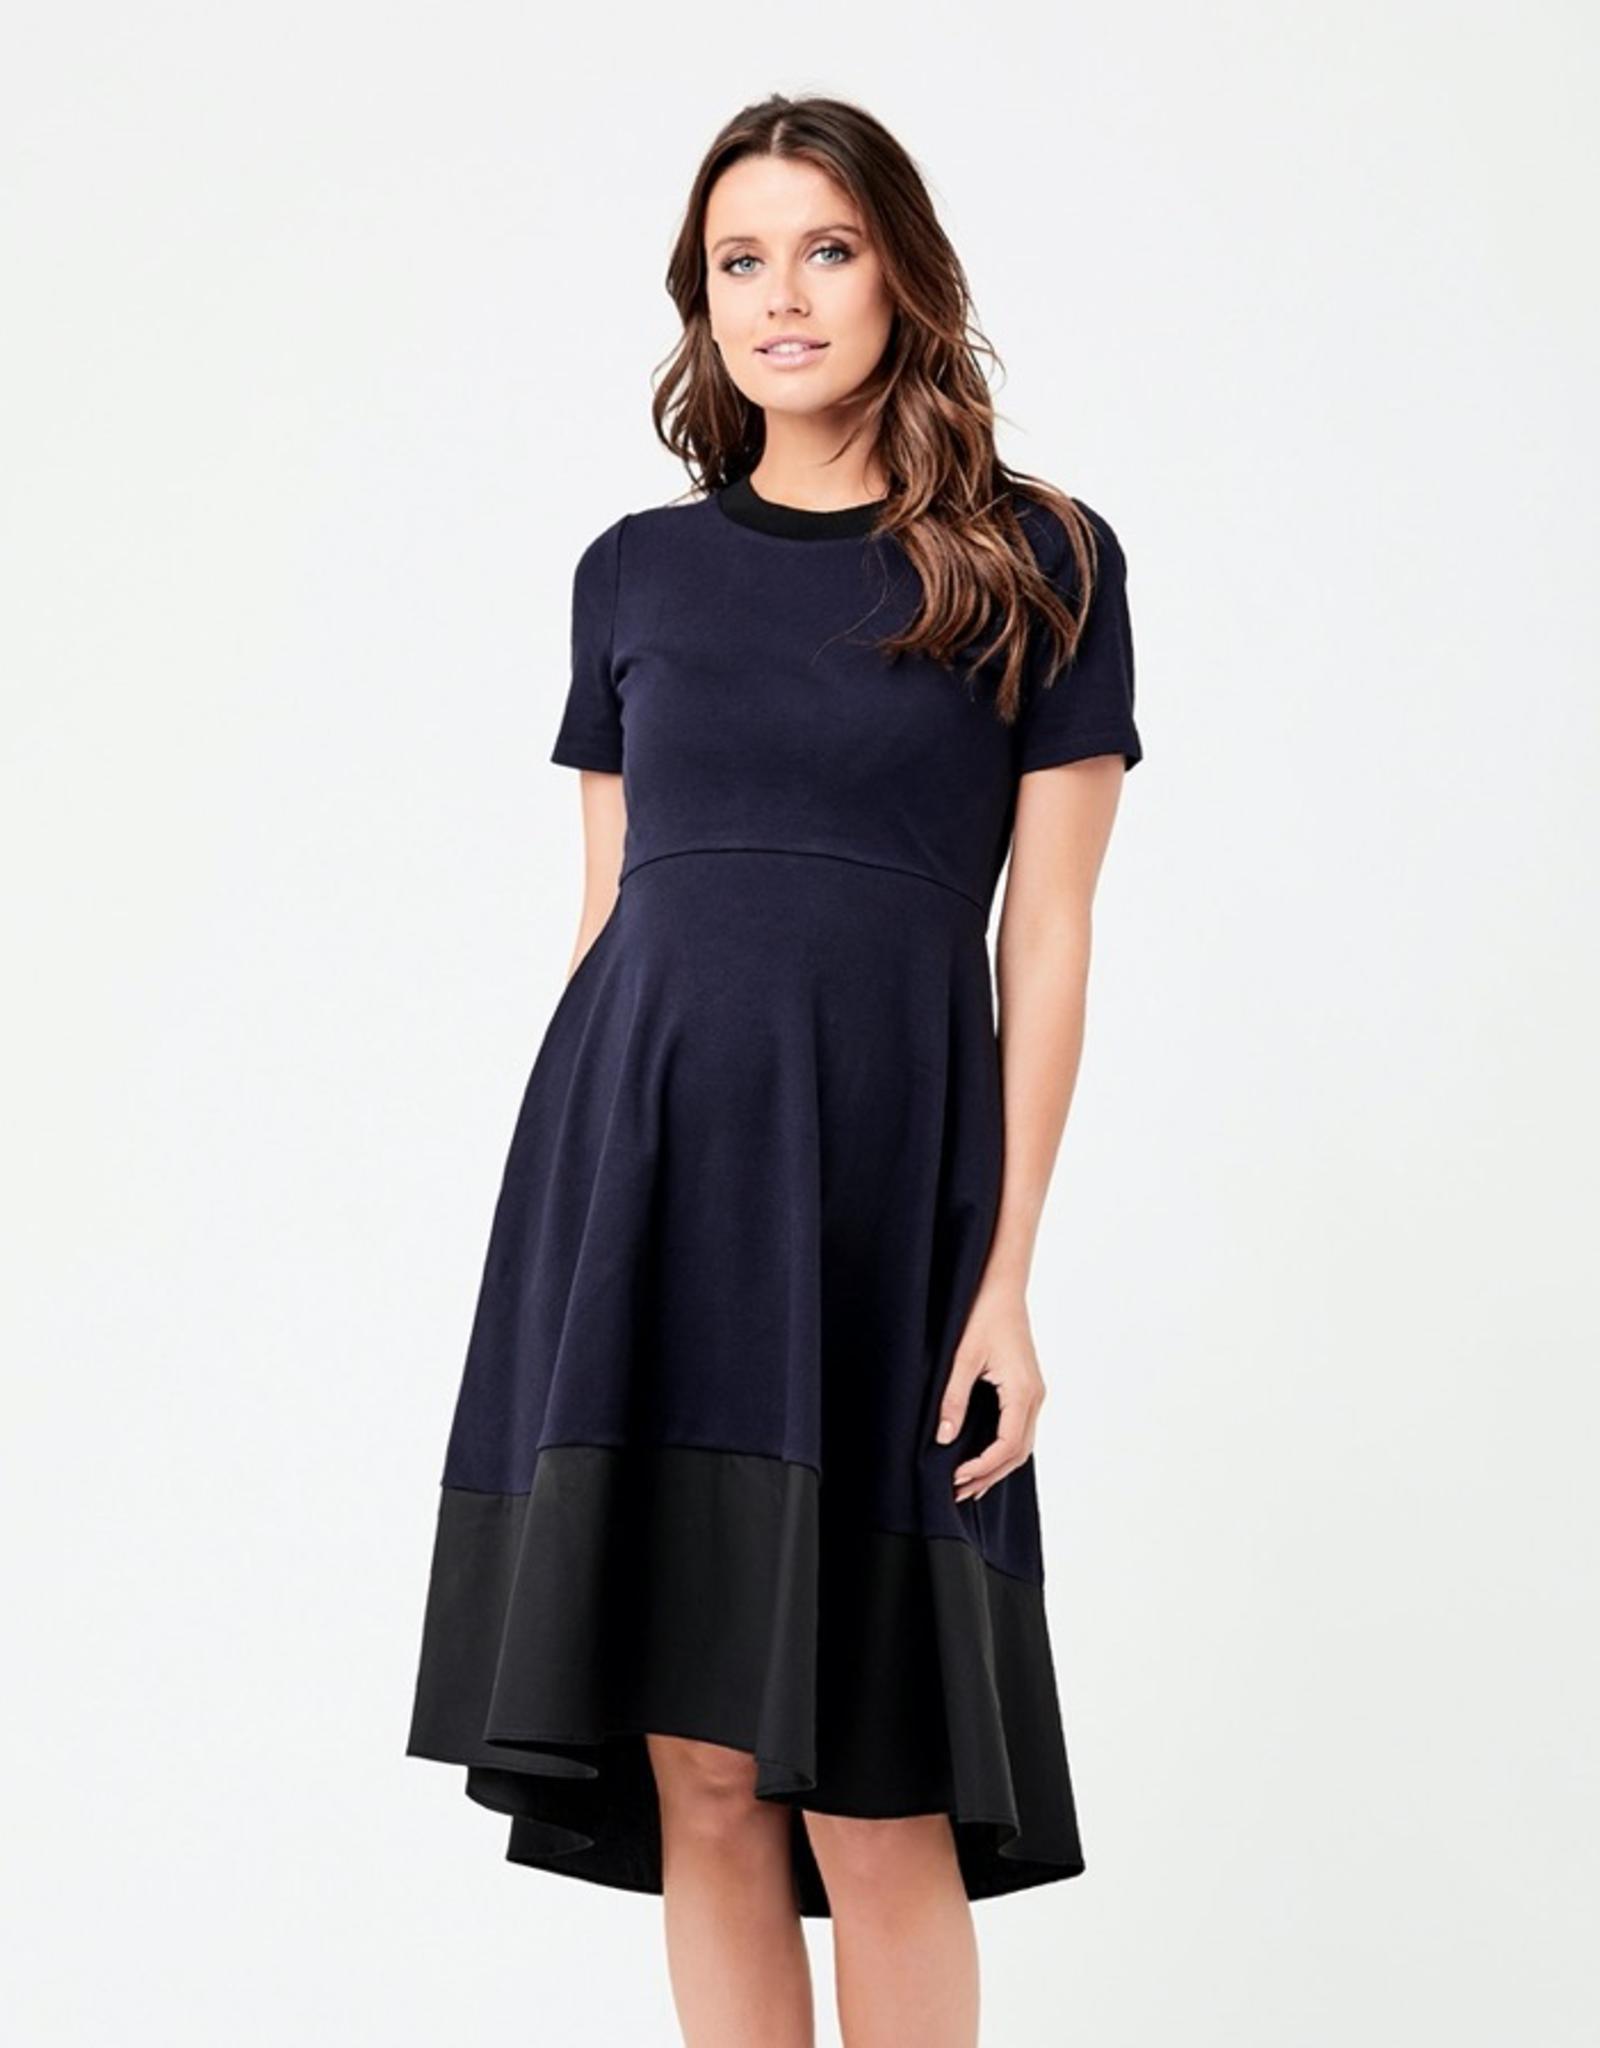 Ripe Maternity Navy & Black Frankie Hi Low Dress